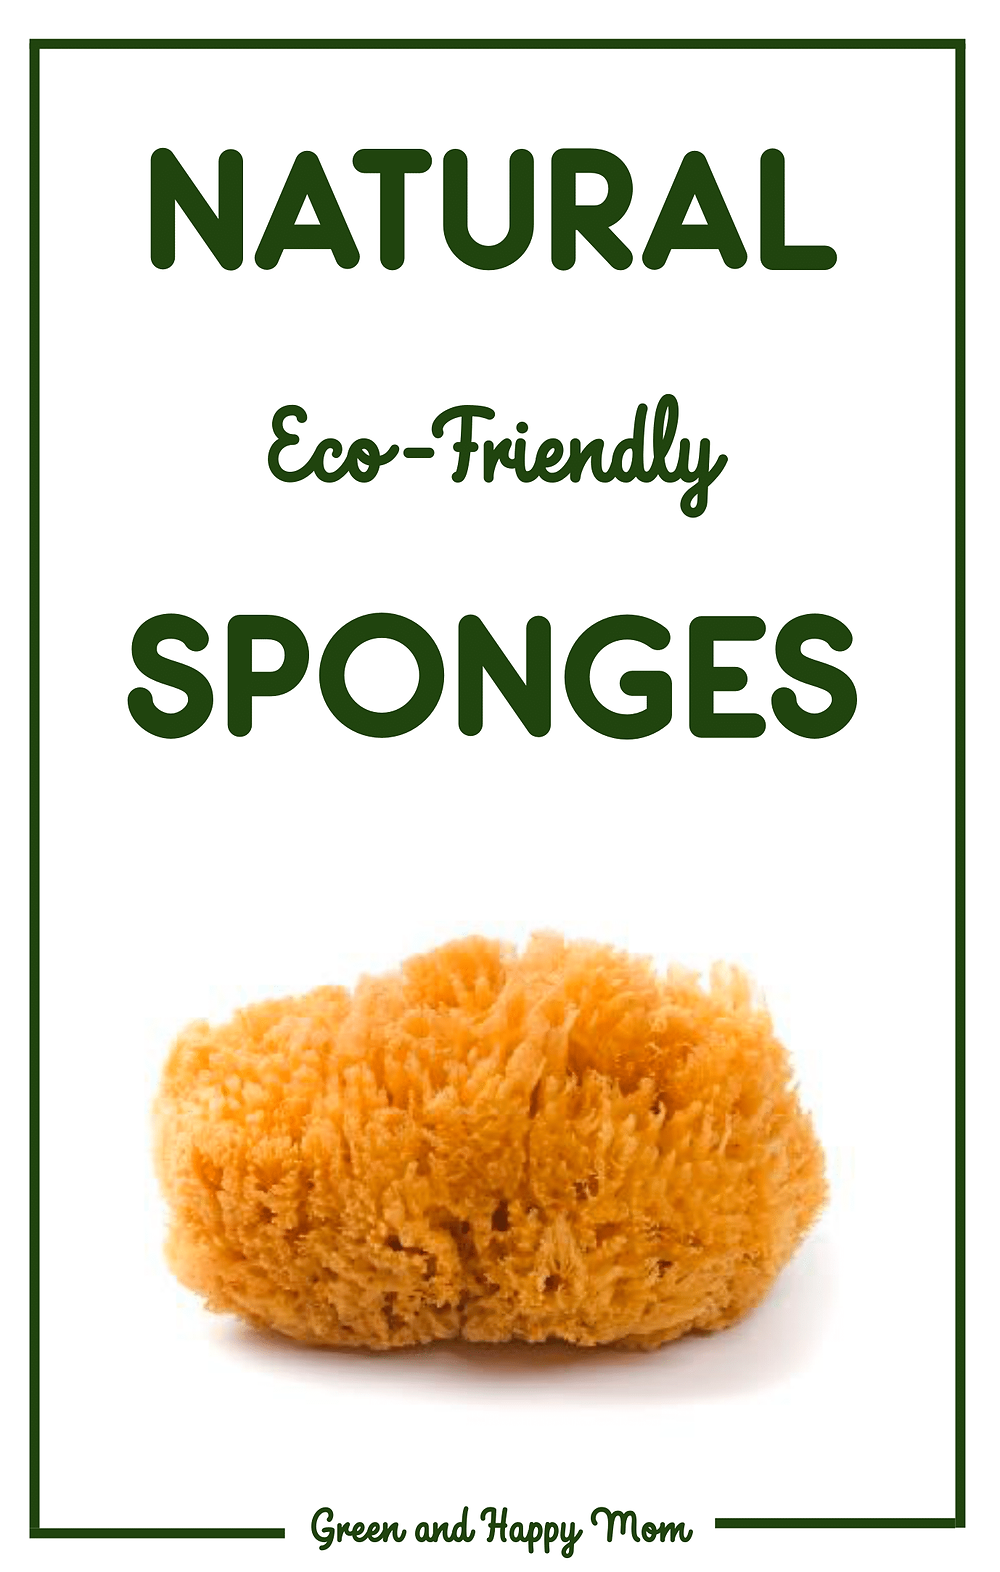 Natural sponges